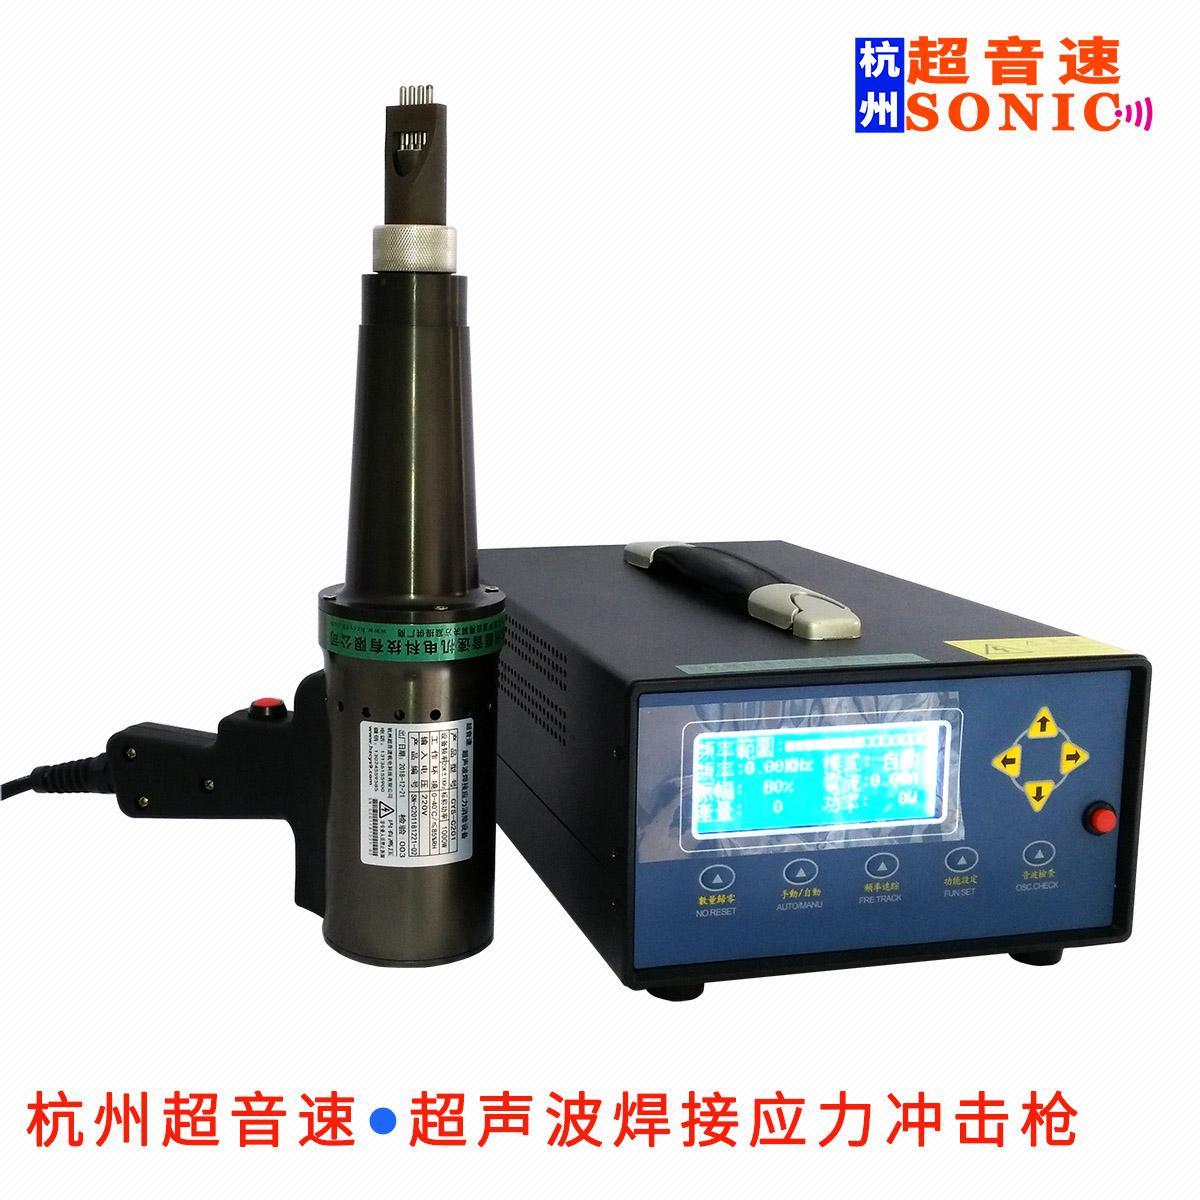 CYS-C20超聲波焊接應力消除設備 3